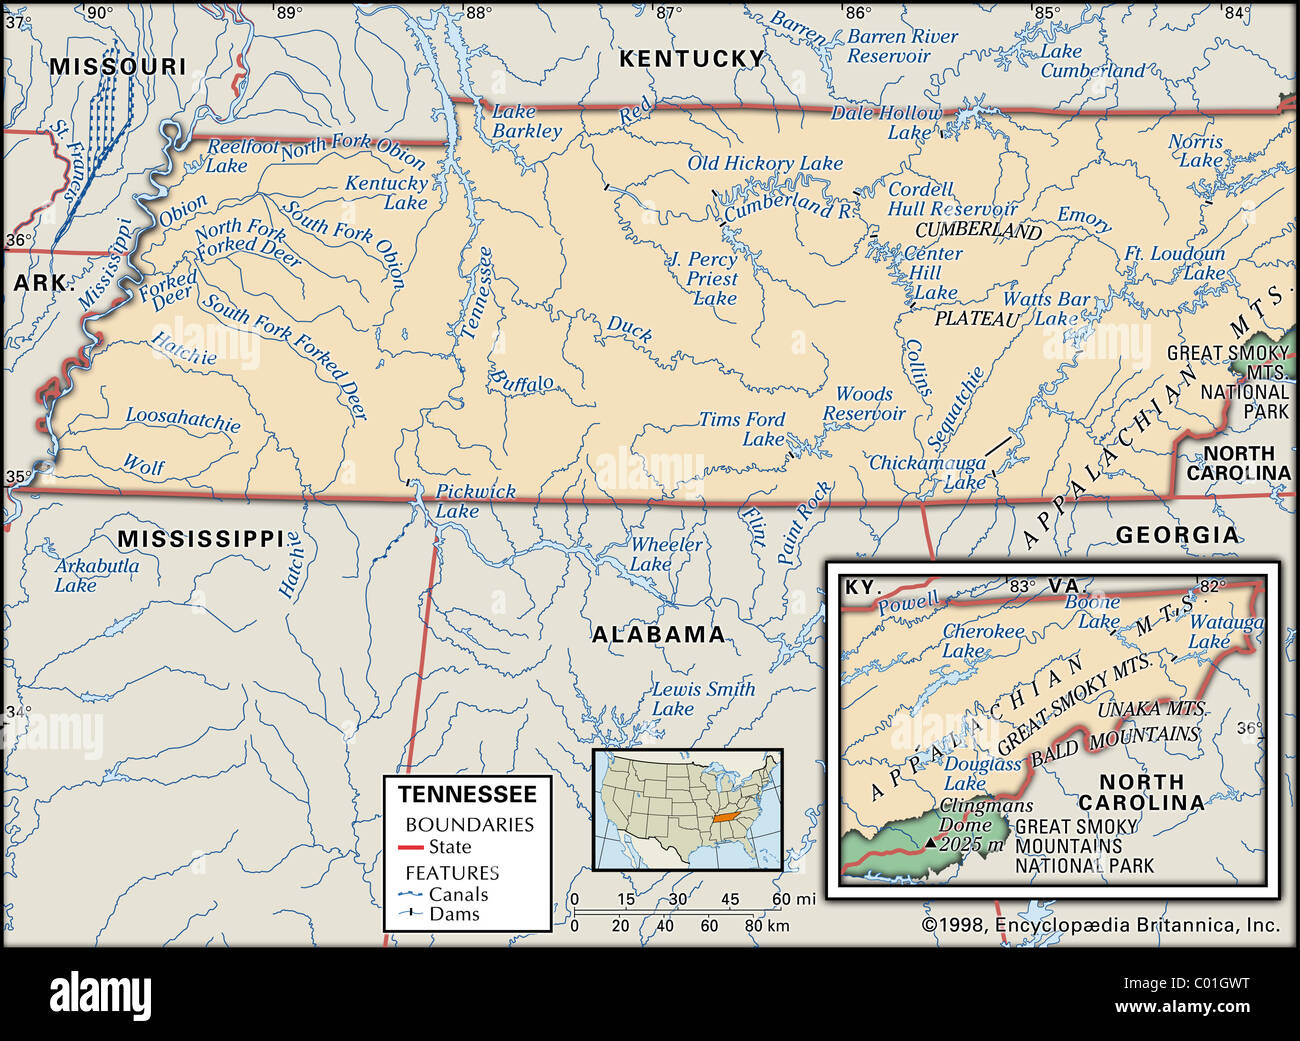 Tennesse River Stockfotos & Tennesse River Bilder - Alamy